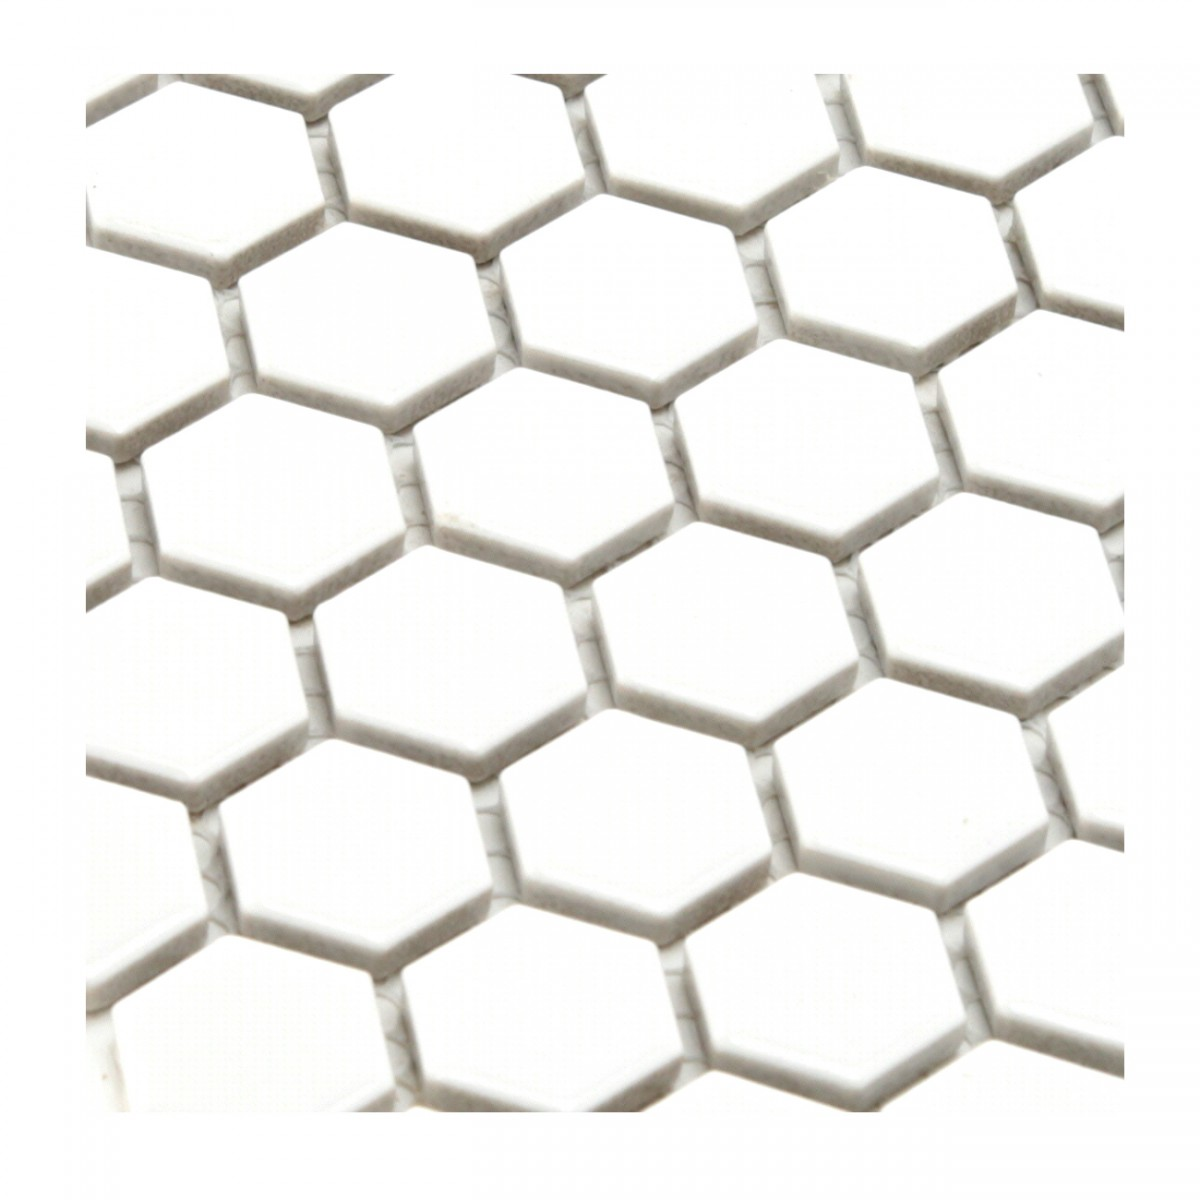 Porcelain Mosaic Hexagon Glossy White Floor and Wall Tile, 1 Tile 10.25 x 11.8 Porcelain Mosaic Hexagon Glossy White Floor Mount Wall Mount Tile Chip Sheet